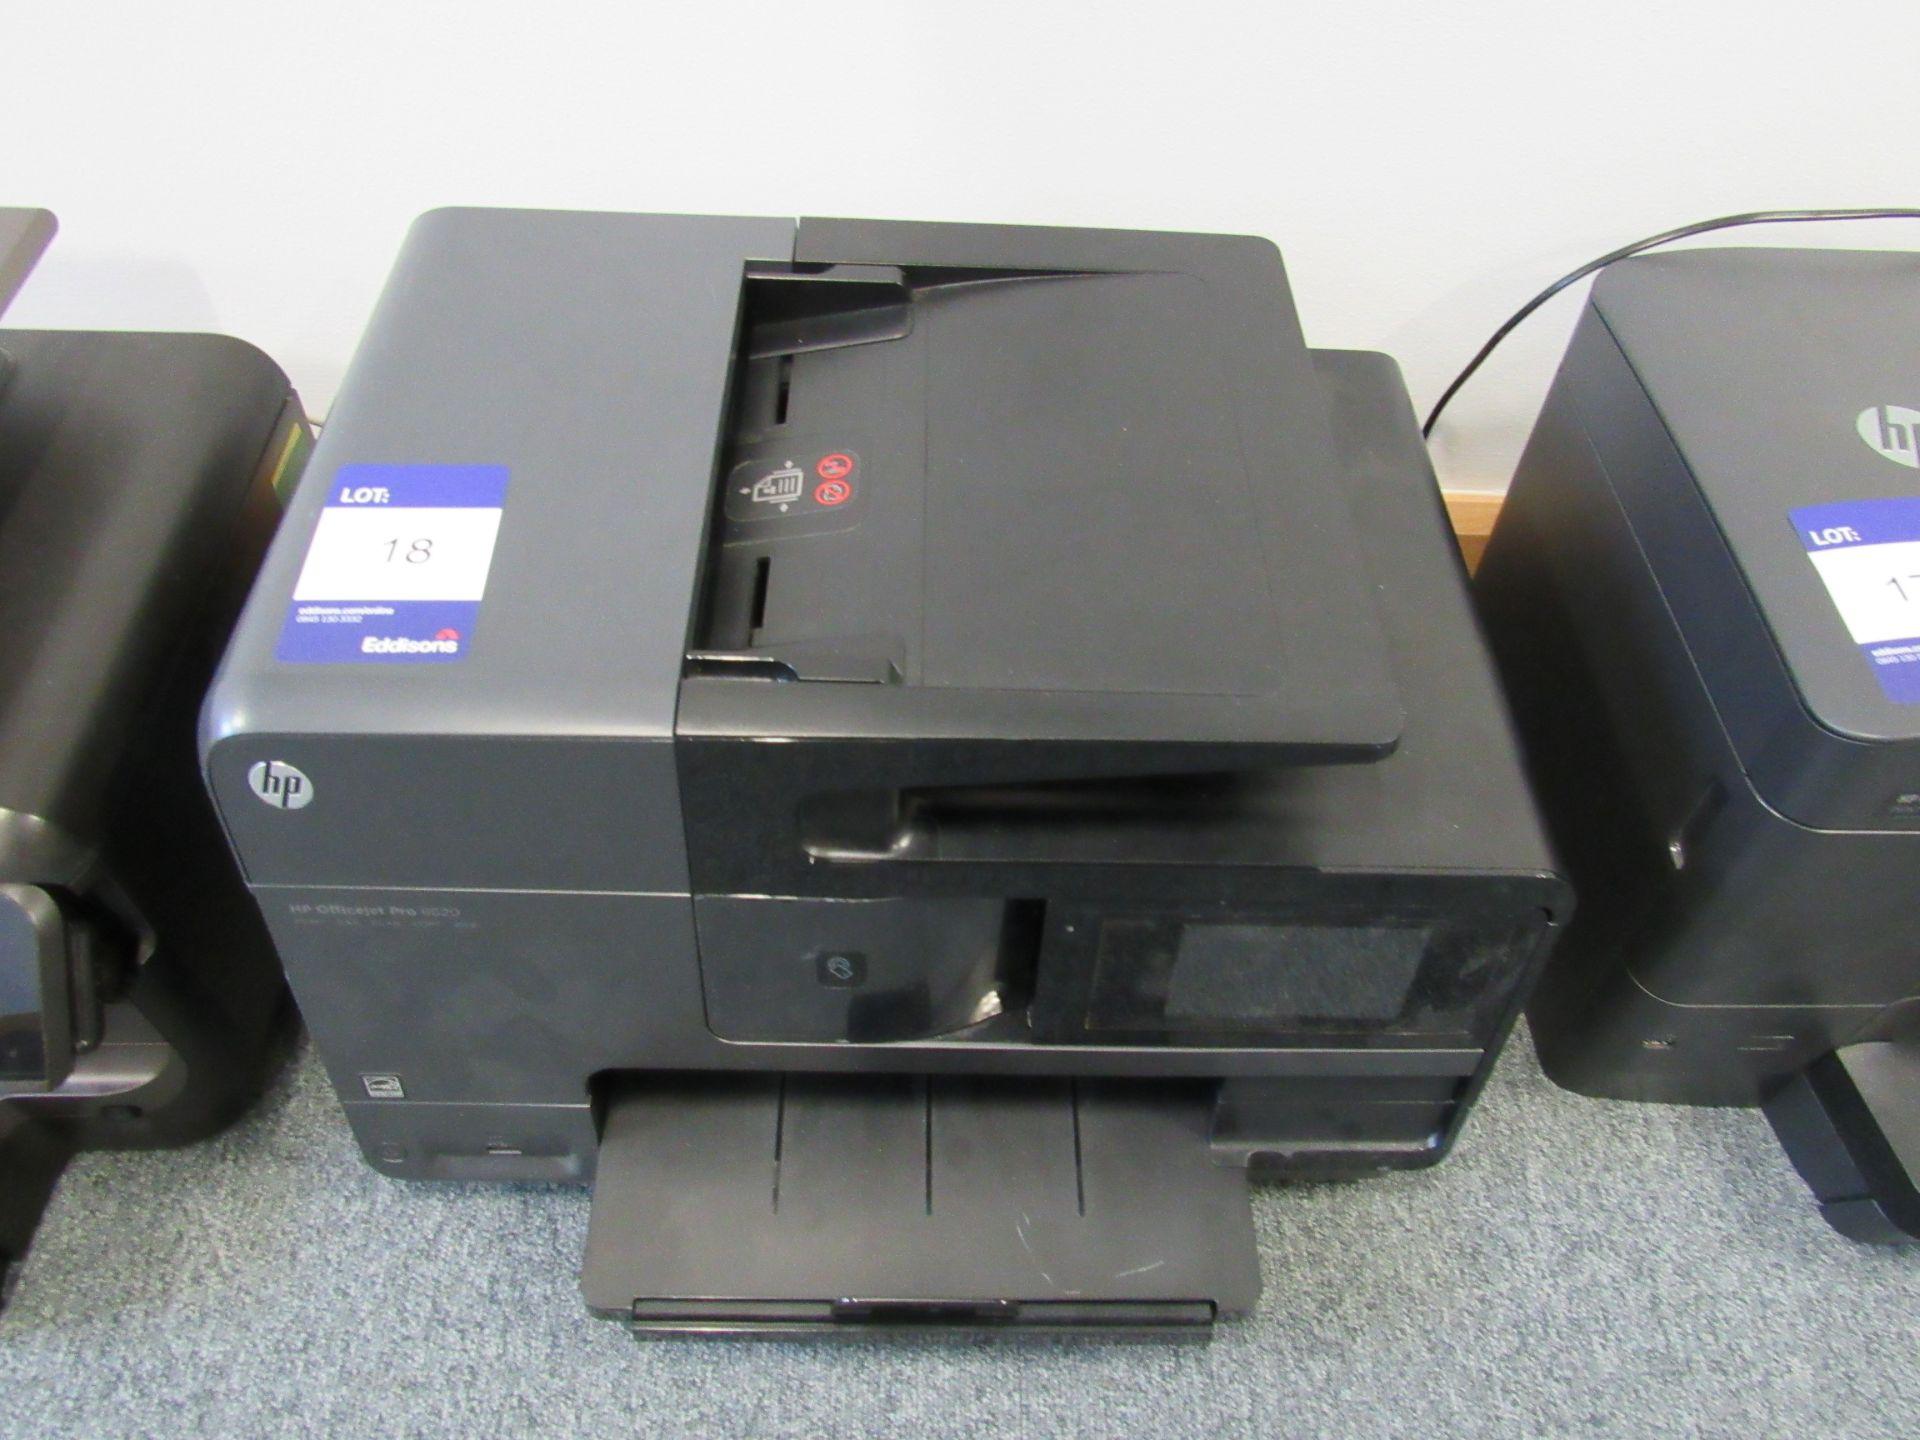 Lot 18 - HP Officejet Pro 8620 All in One Fax/Scan/Printer/Copier